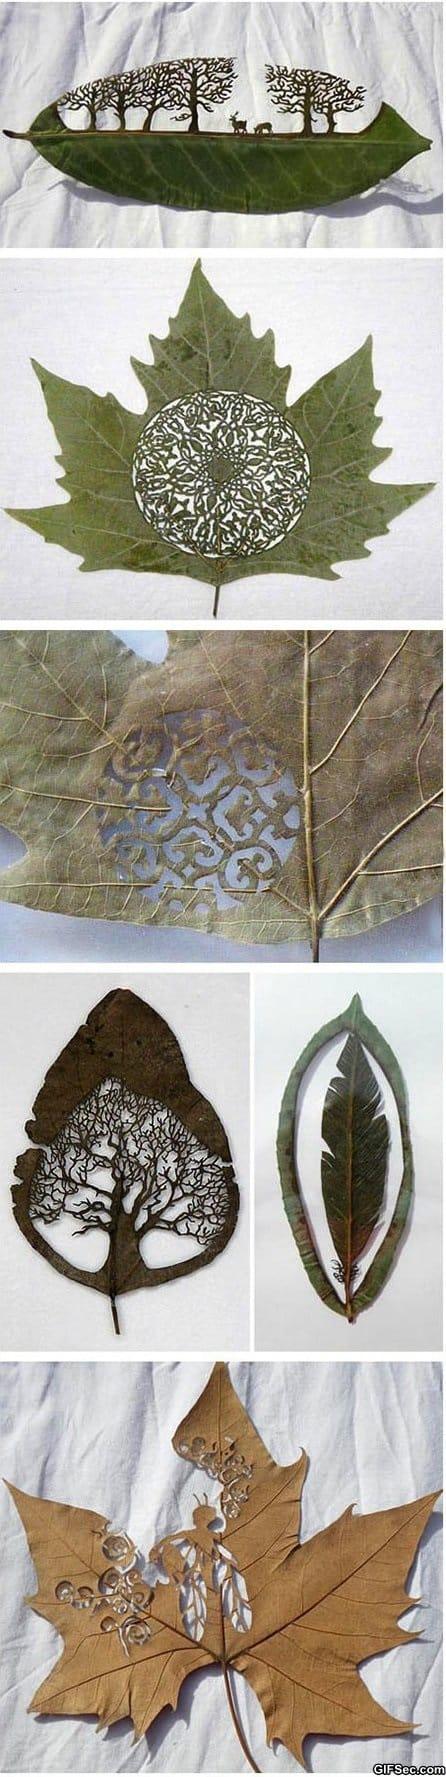 art-in-a-leaf